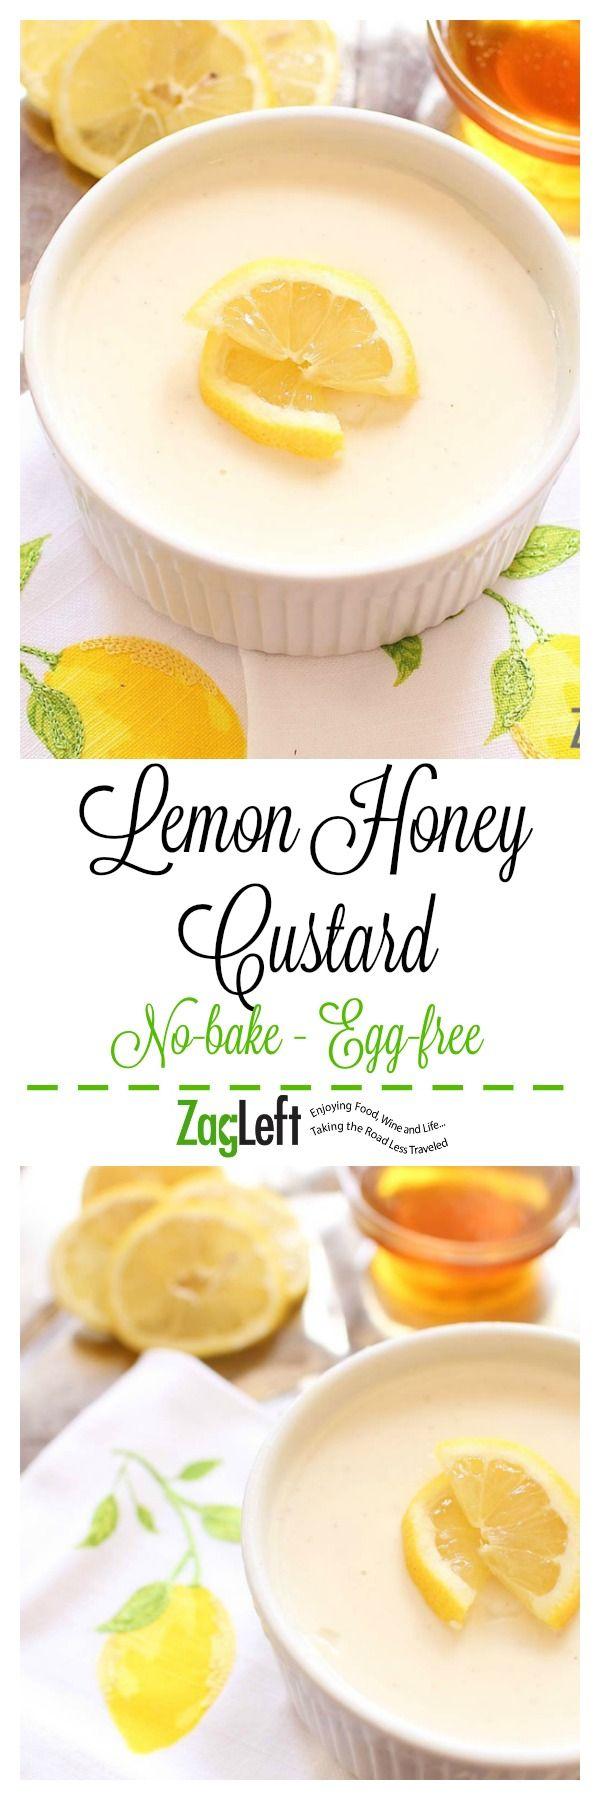 Lemon Honey Custard for One. Quick and easy. 1 cup heavy cream 1 tablespoon honey 1 1/2 tablespoons sugar 1/8 teaspoon ground nutmeg 1 inch strip lemon peel 2 tablespoons lemon juice 1/4 teaspoon vanilla extract